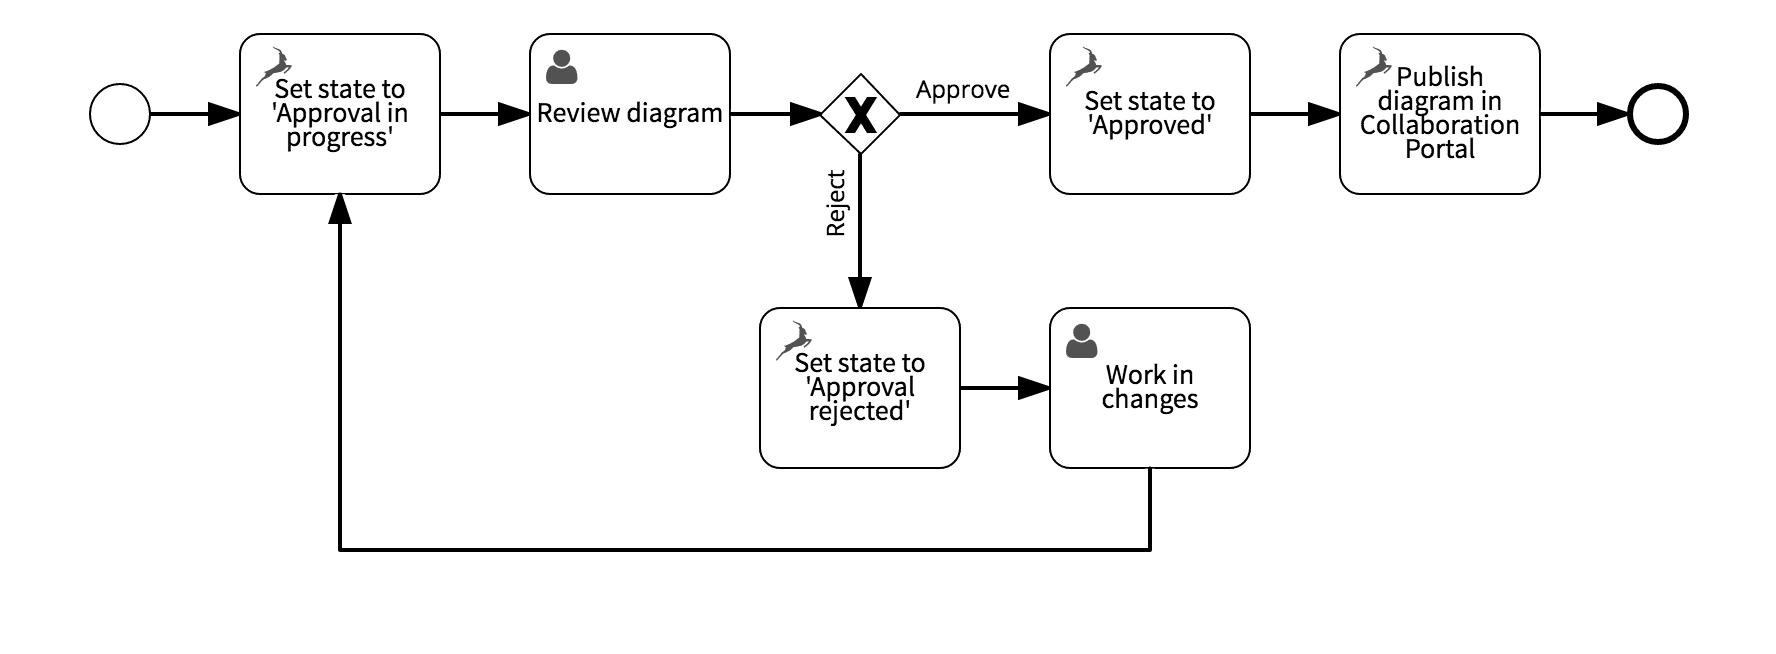 BPMN_Diagramm_Approval_Workflow